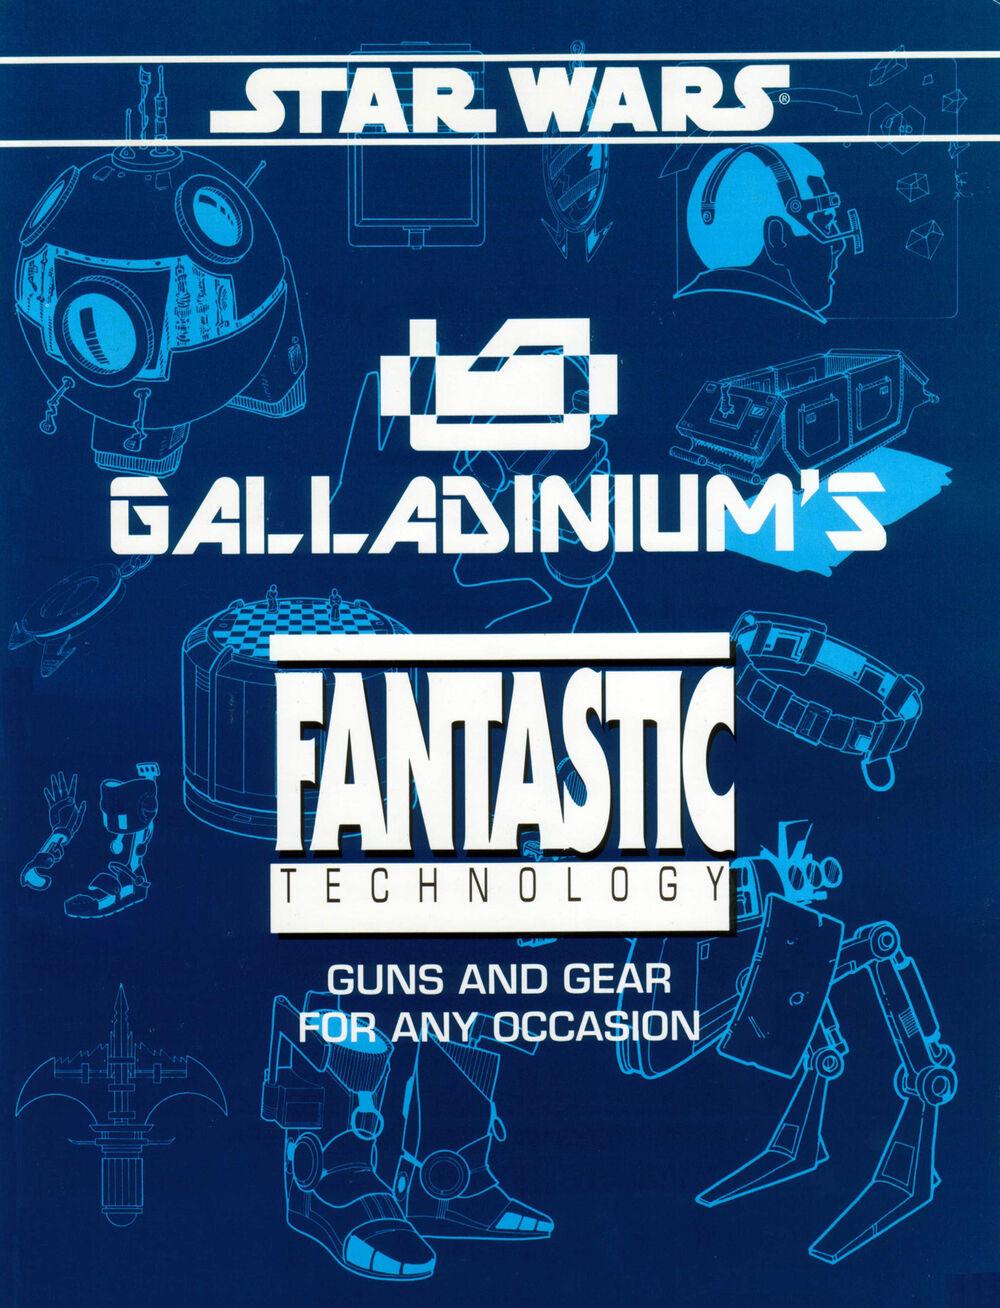 Star Wars: Galladinium's Fantastic Technology